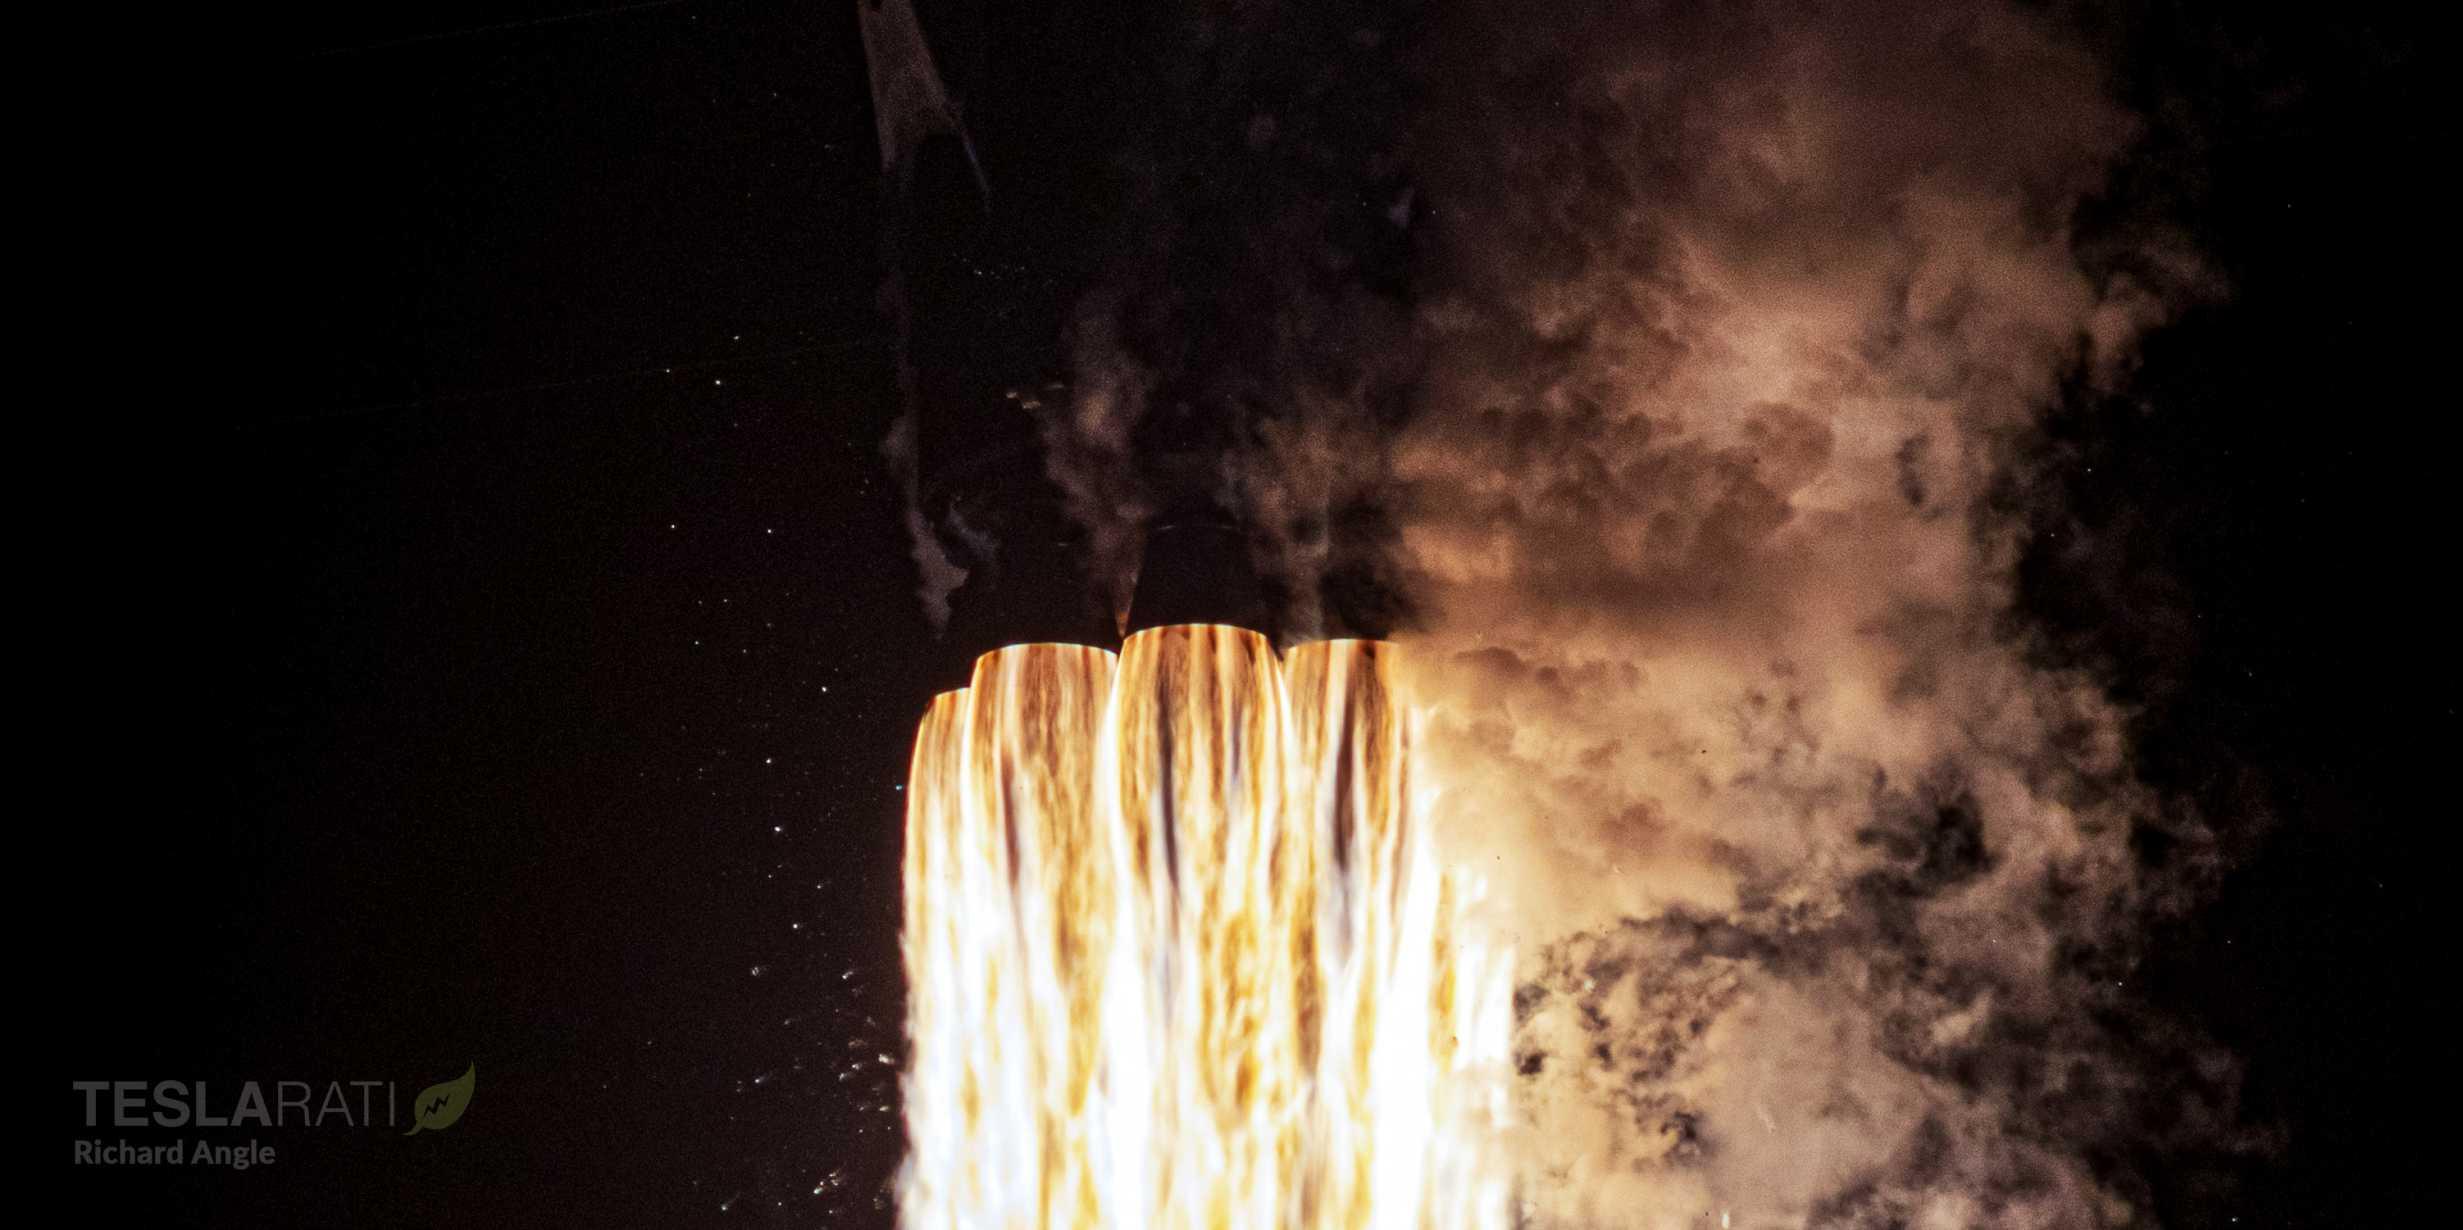 Starlink V1 L8 Falcon 9 B1059 LC40 061320 (Richard Angle) launch 3 crop (c)